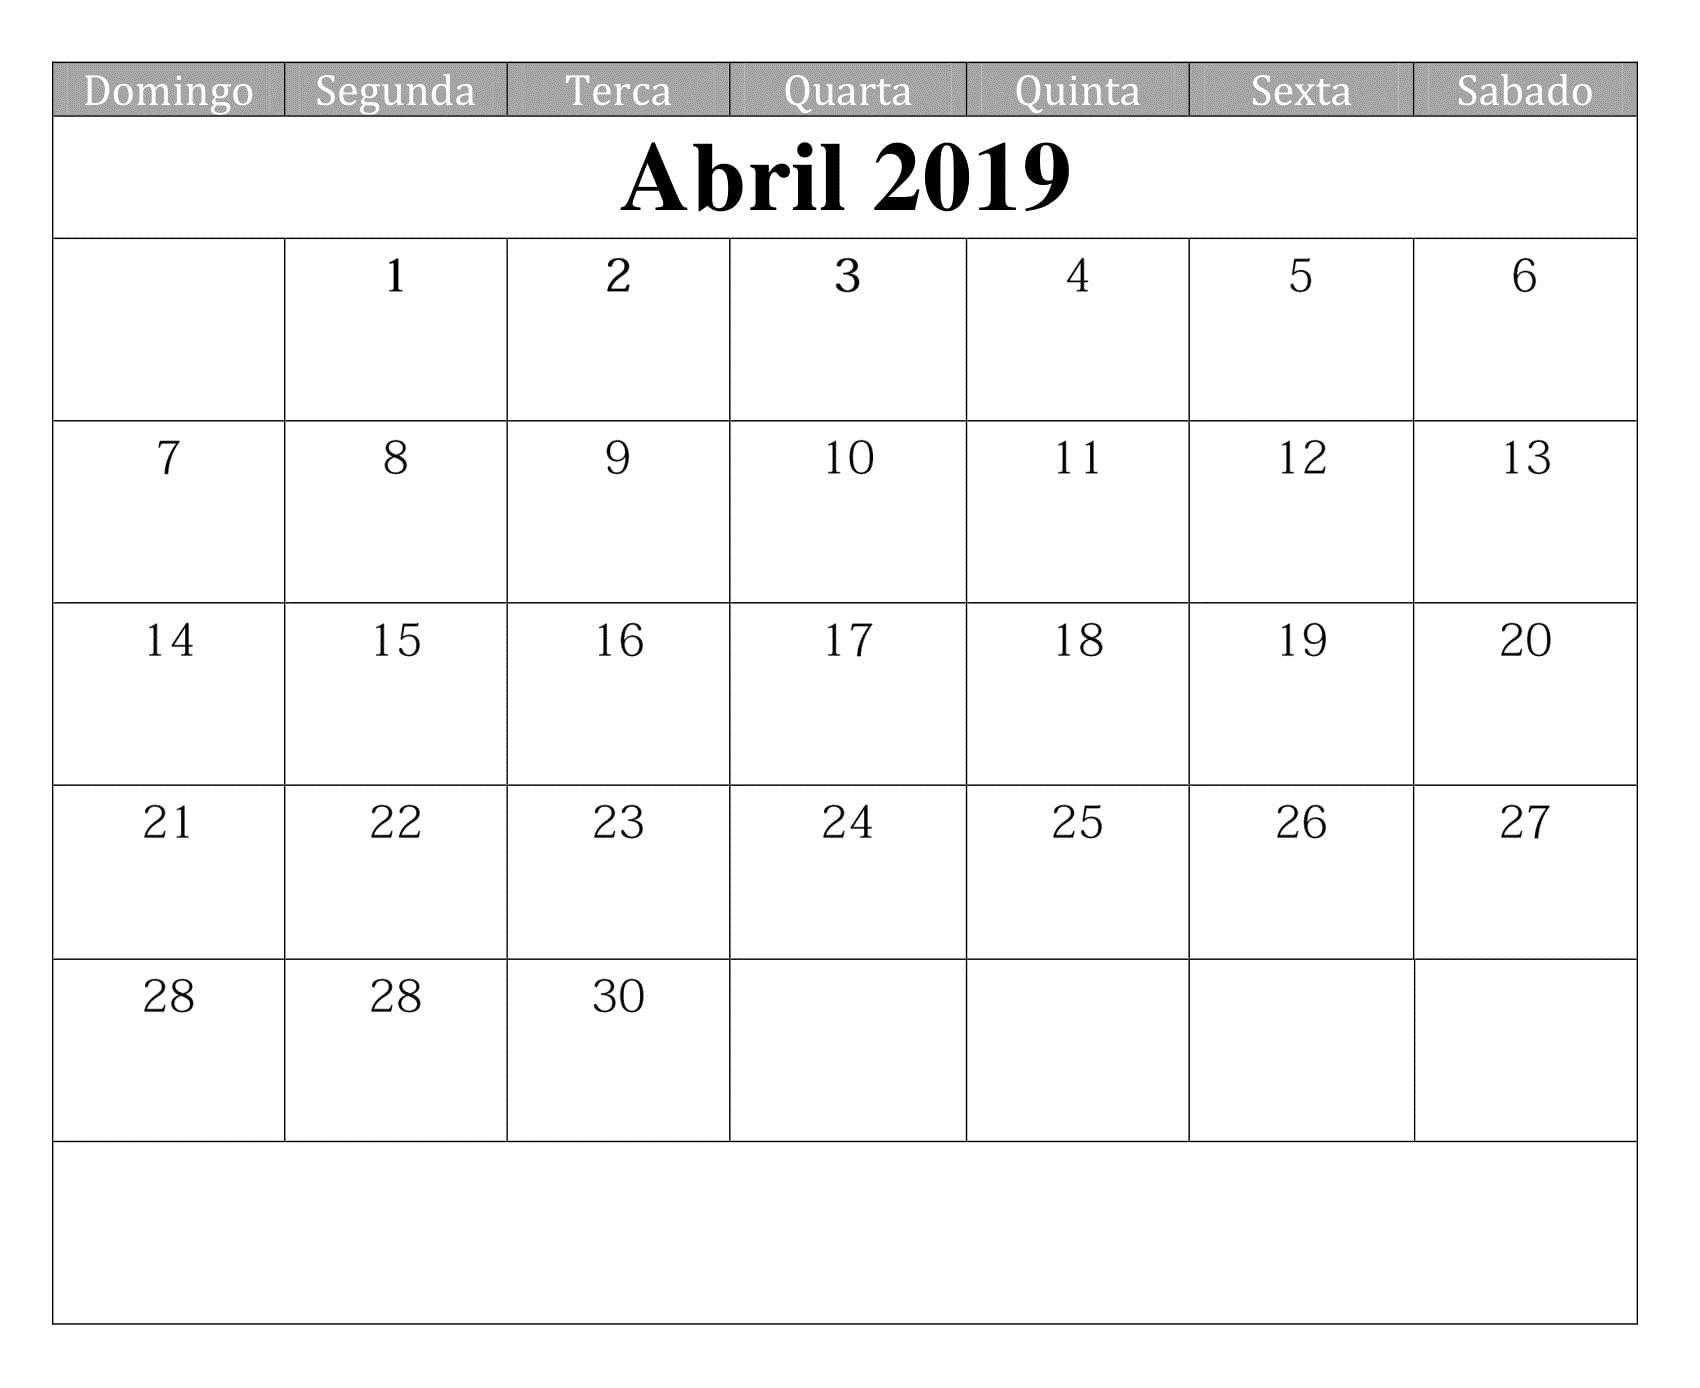 Calendario 2019 Estilos Para Imprimir Abril t